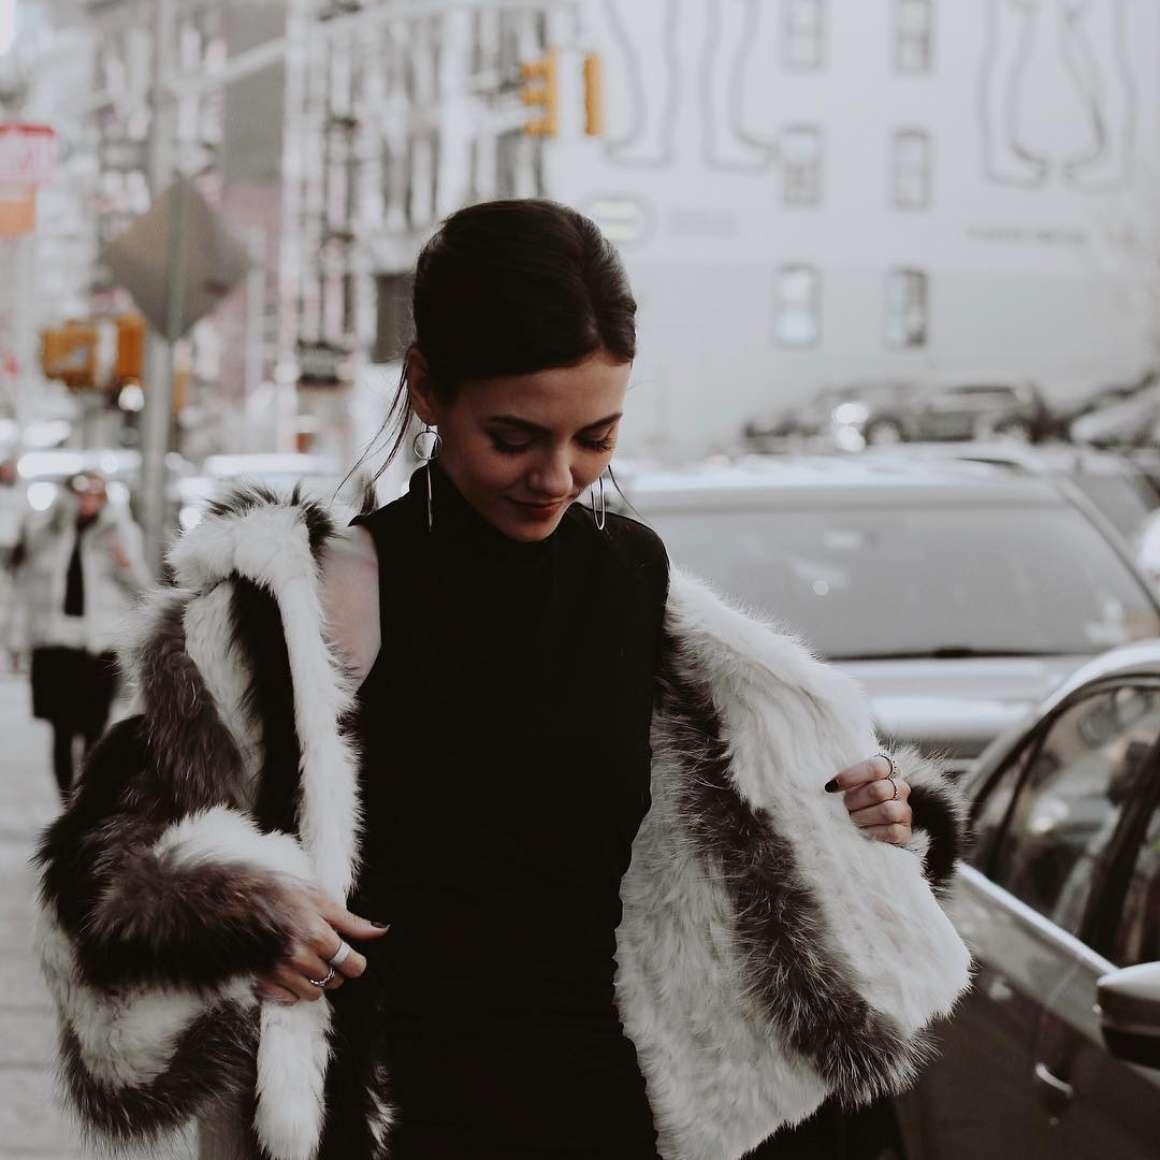 Victoria Justice 2019 : Victoria Justice: Amy Morse photoshoot in New York -01